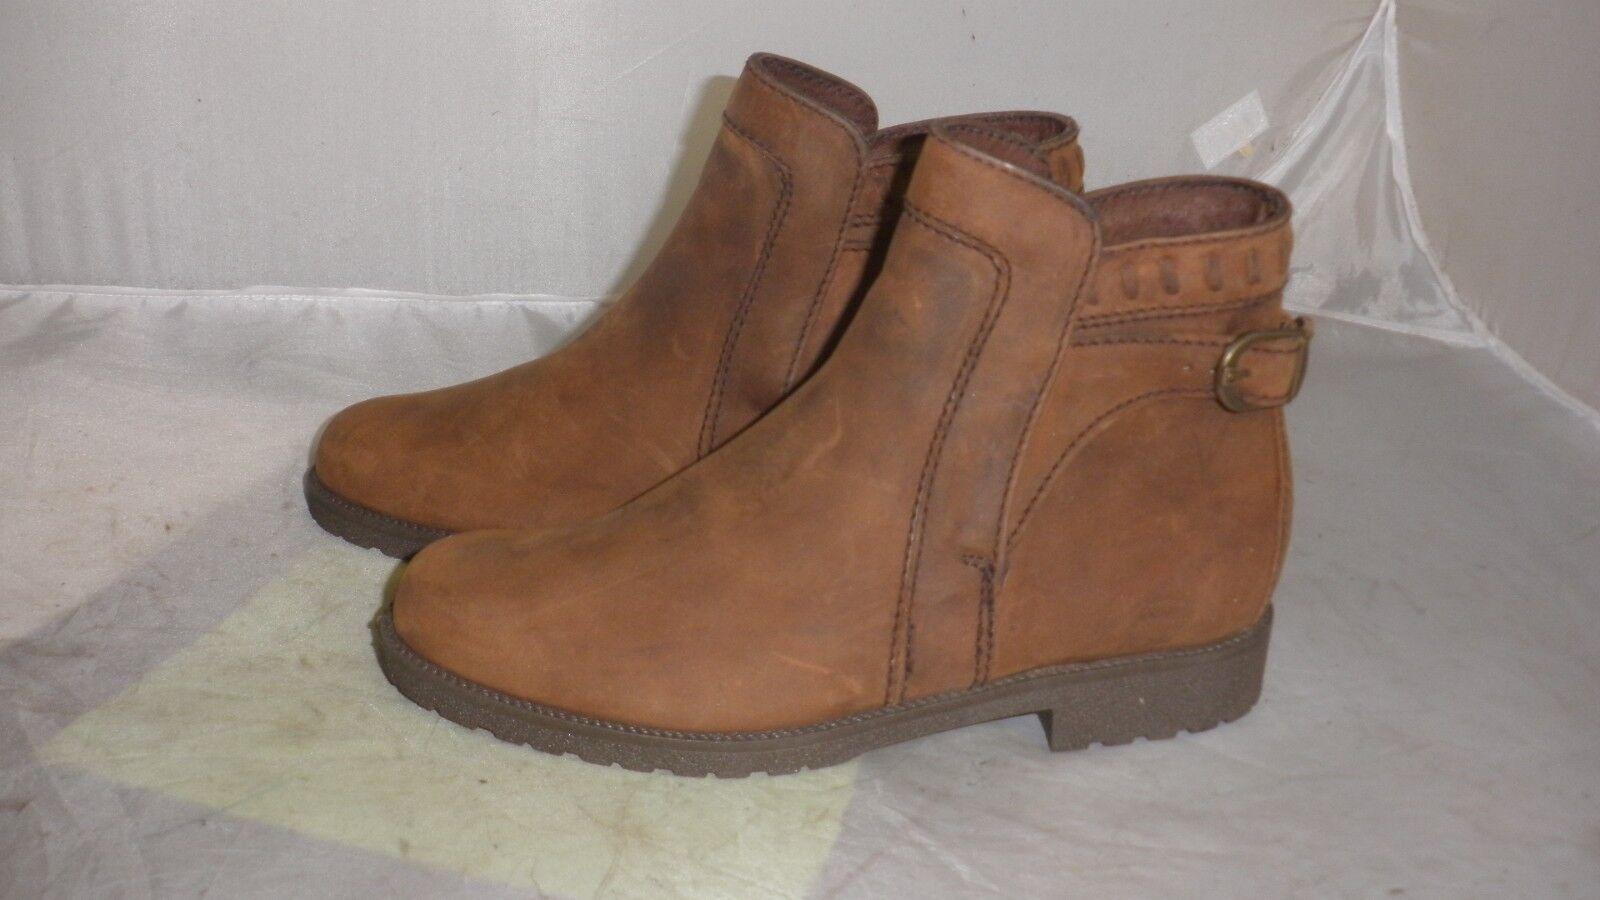 Aigle Aztec   ldren's Brown Leather Upper Short Boots Size 1  the best online store offer